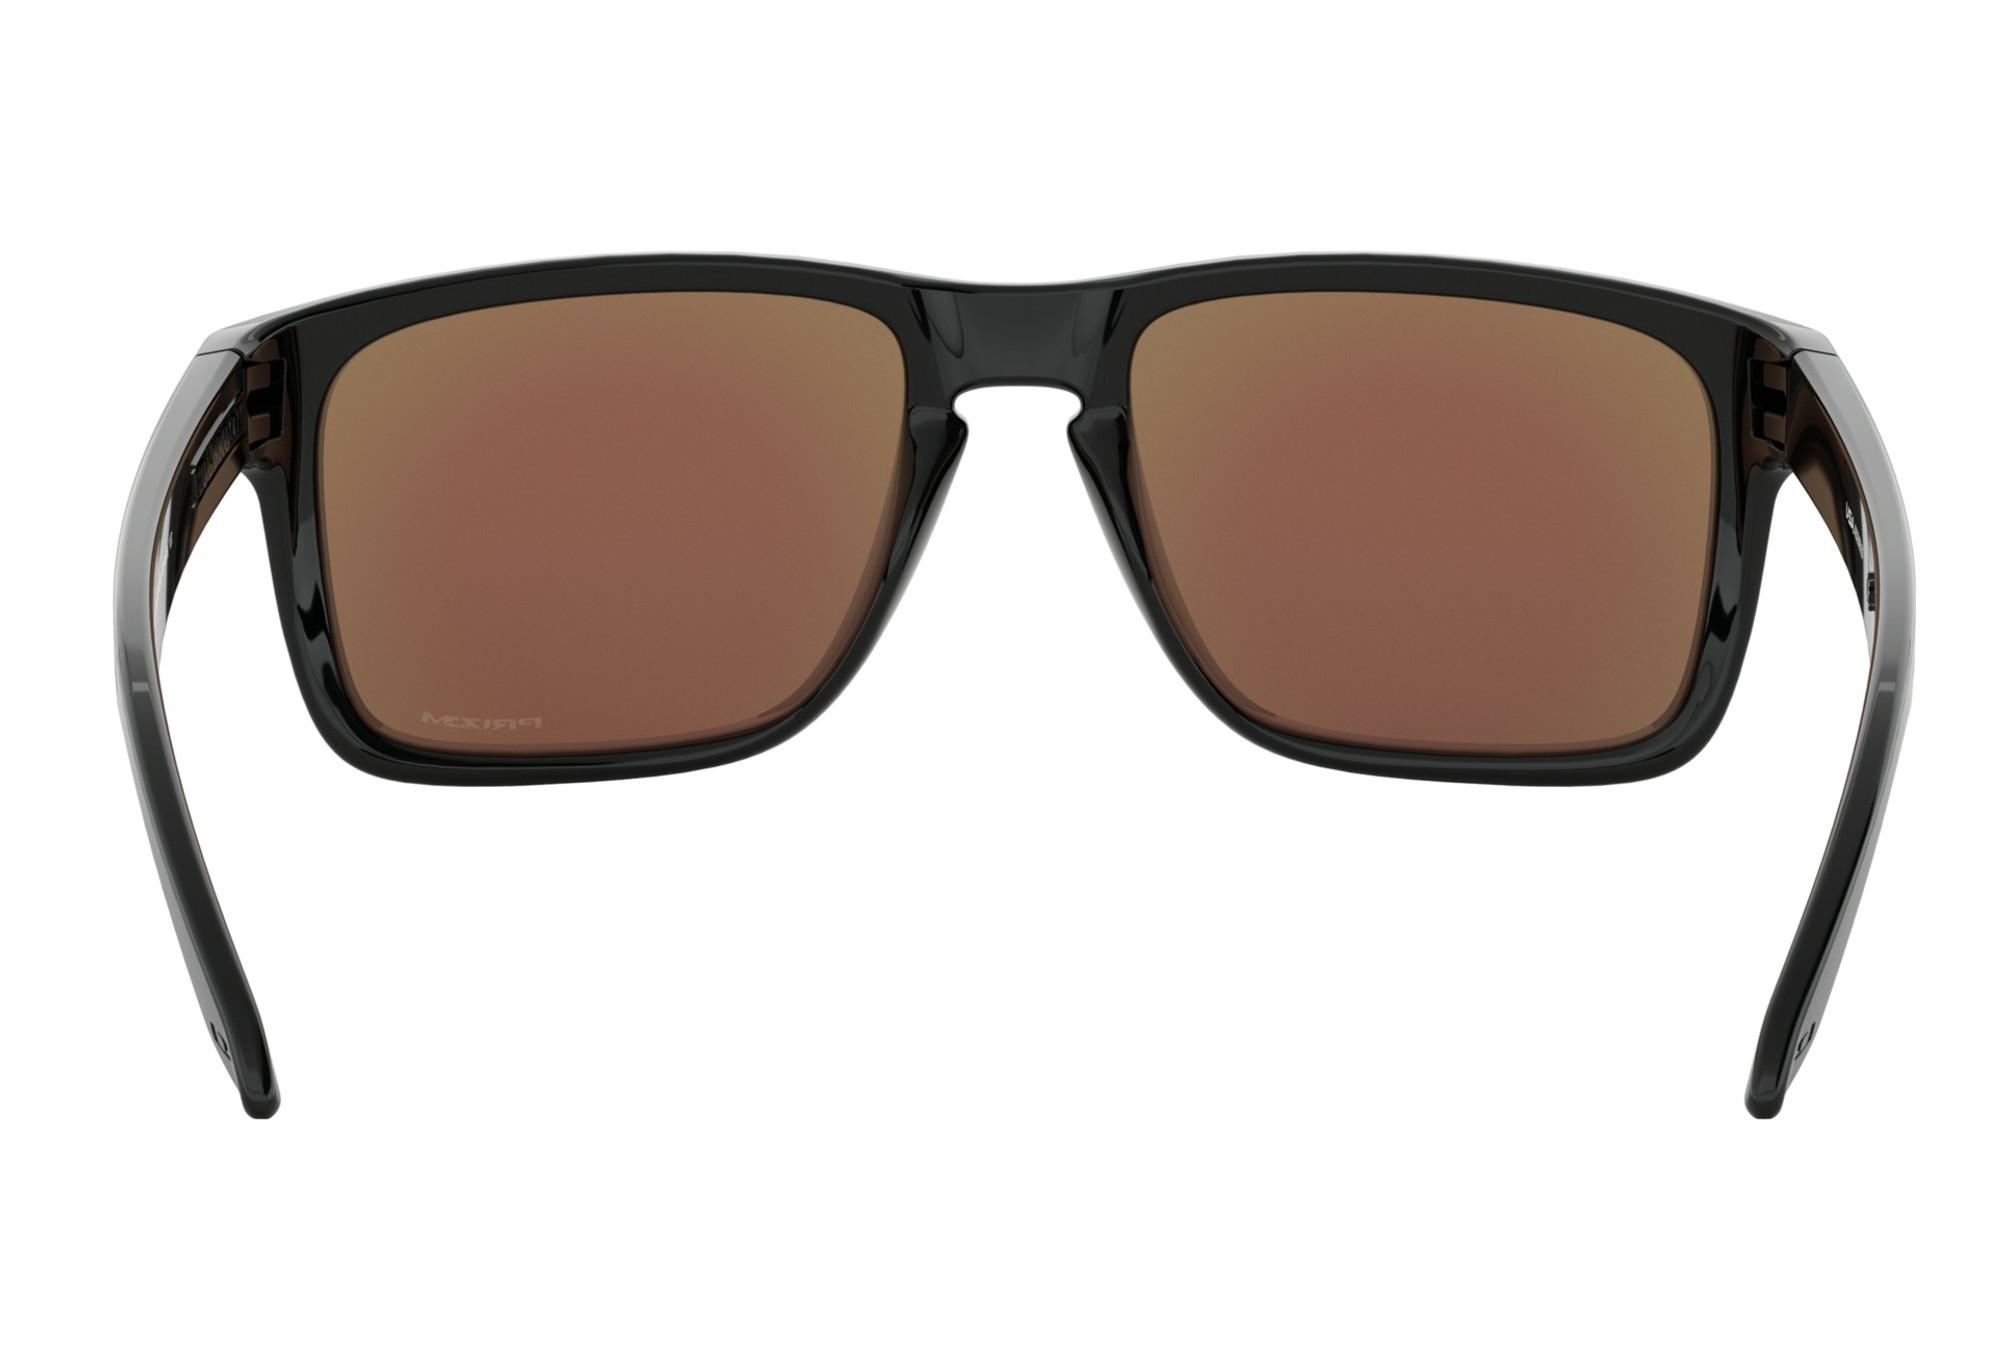 6fb805d0c3 Oakley Holbrook XL Sunglasses Black - Prizm Sapphire OO9417-0359 ...